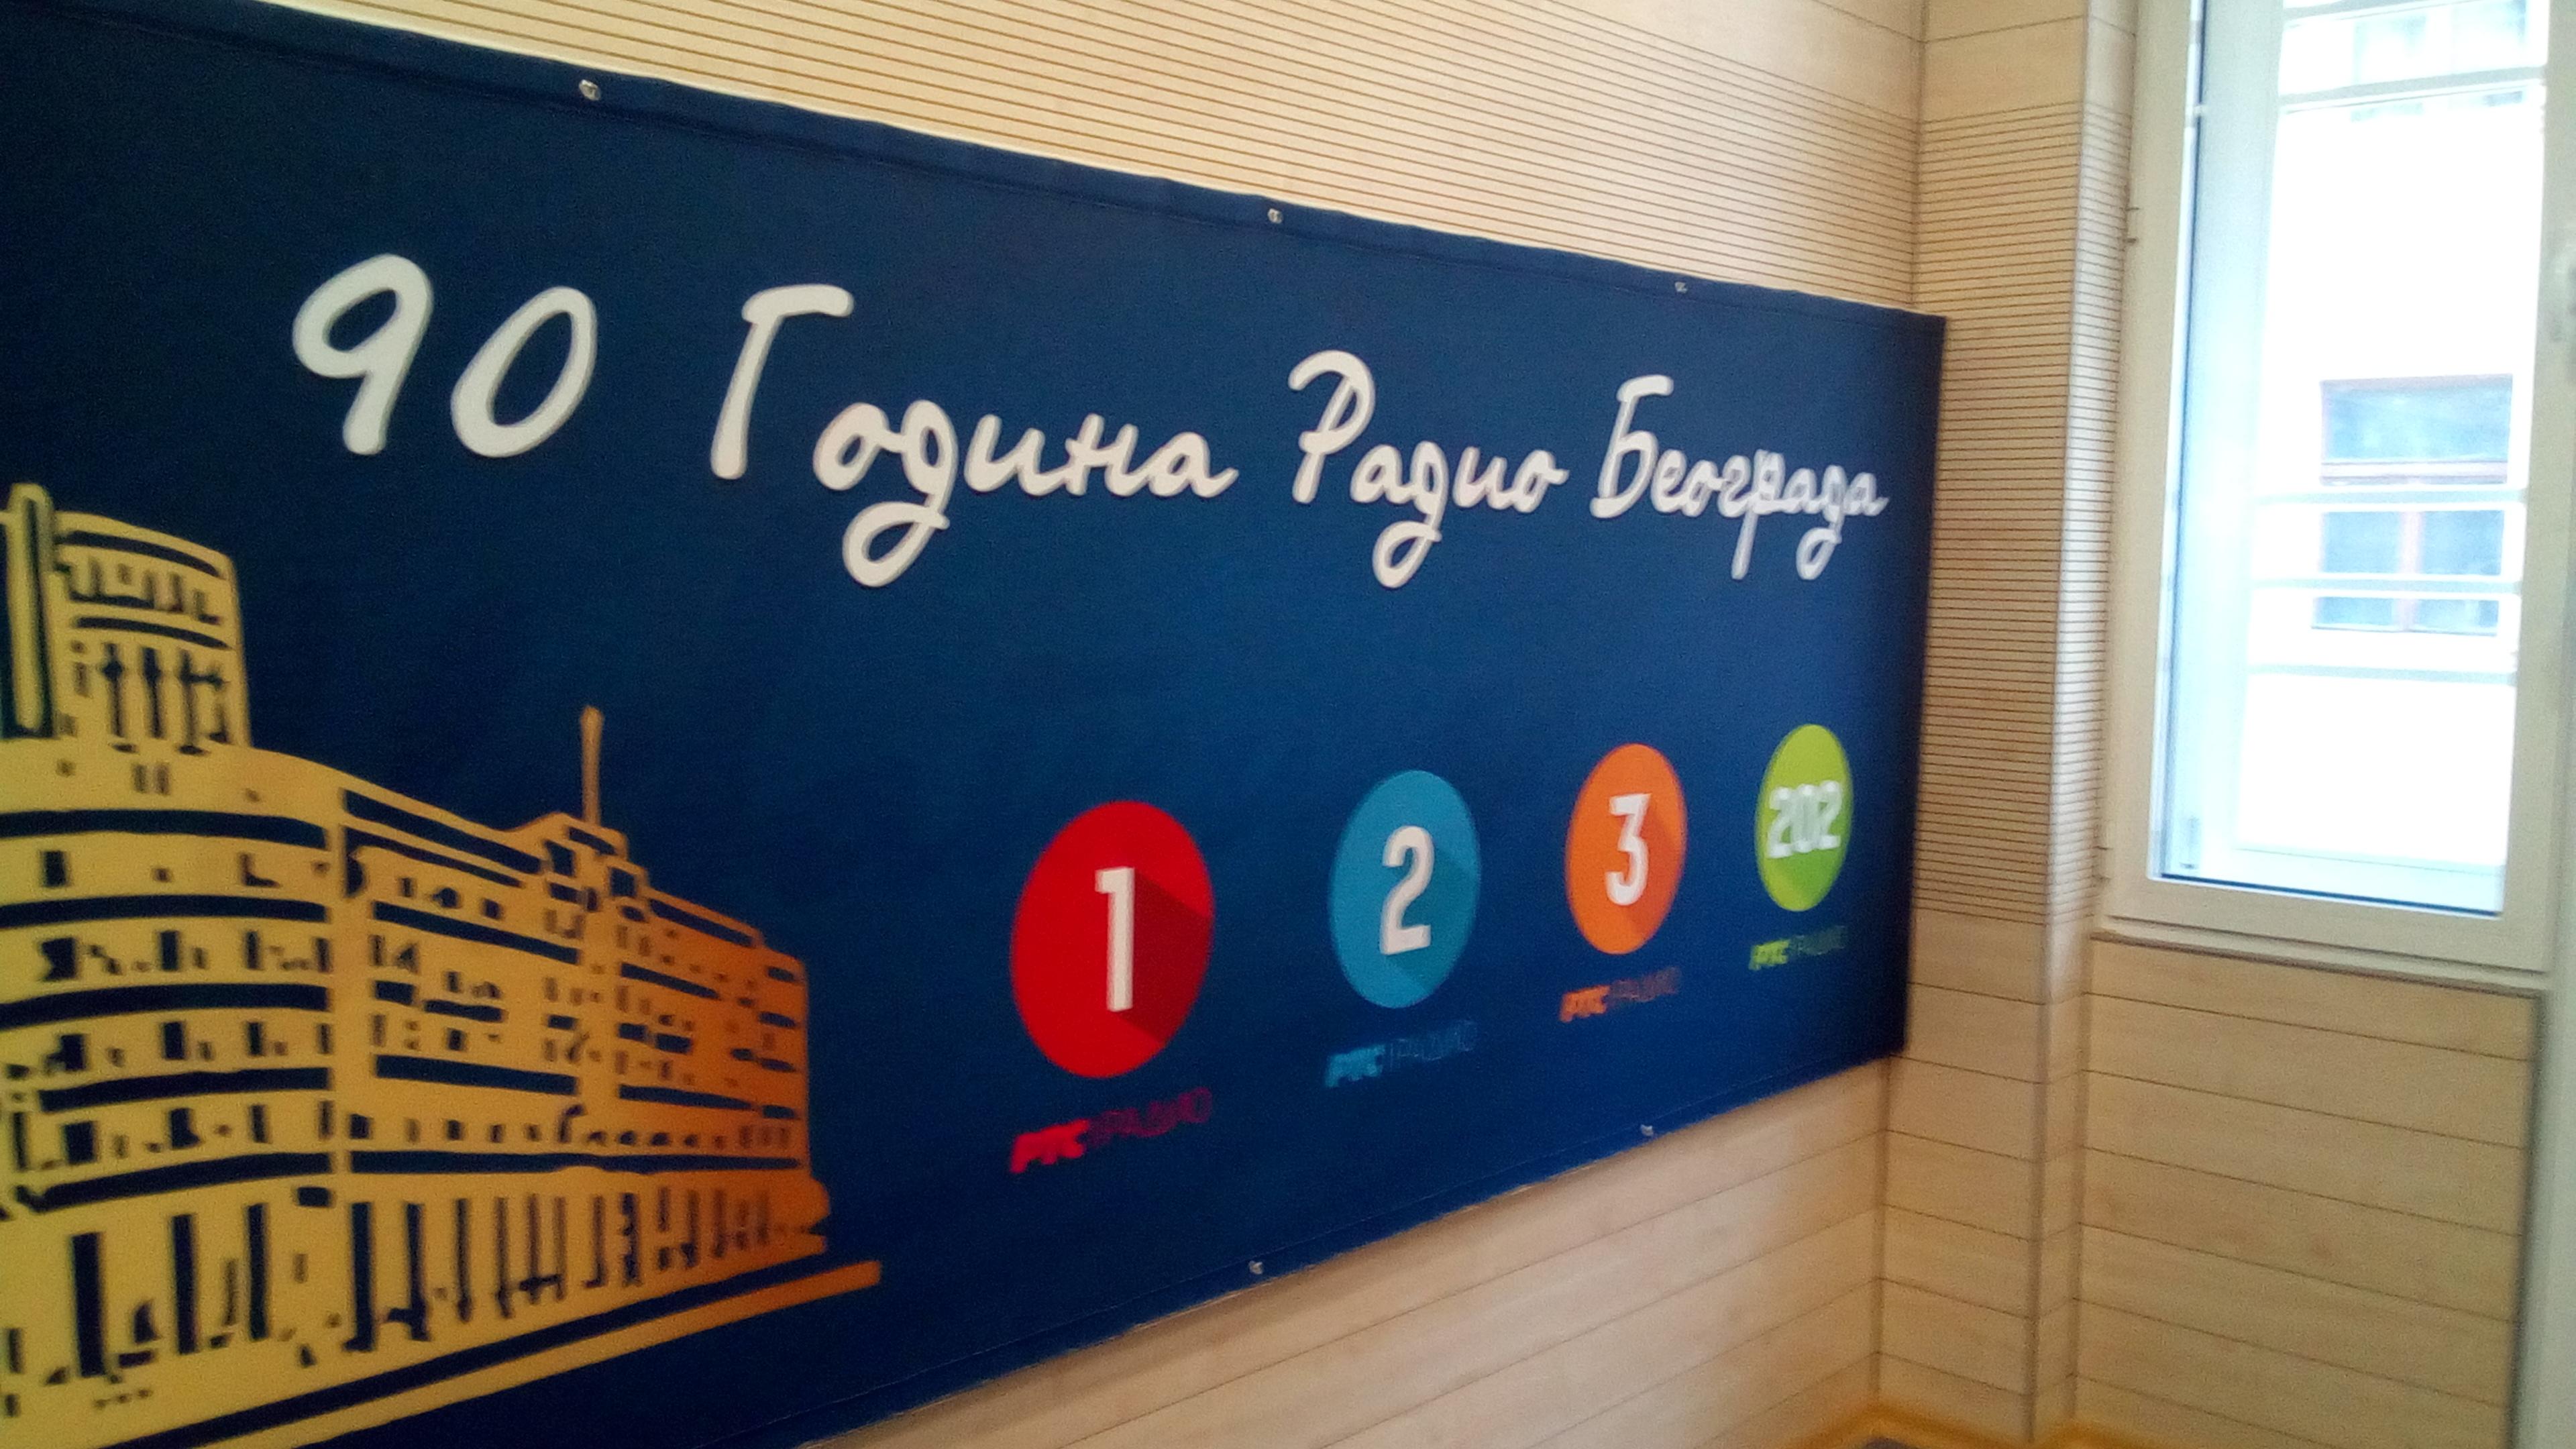 Radio-Beograd-1